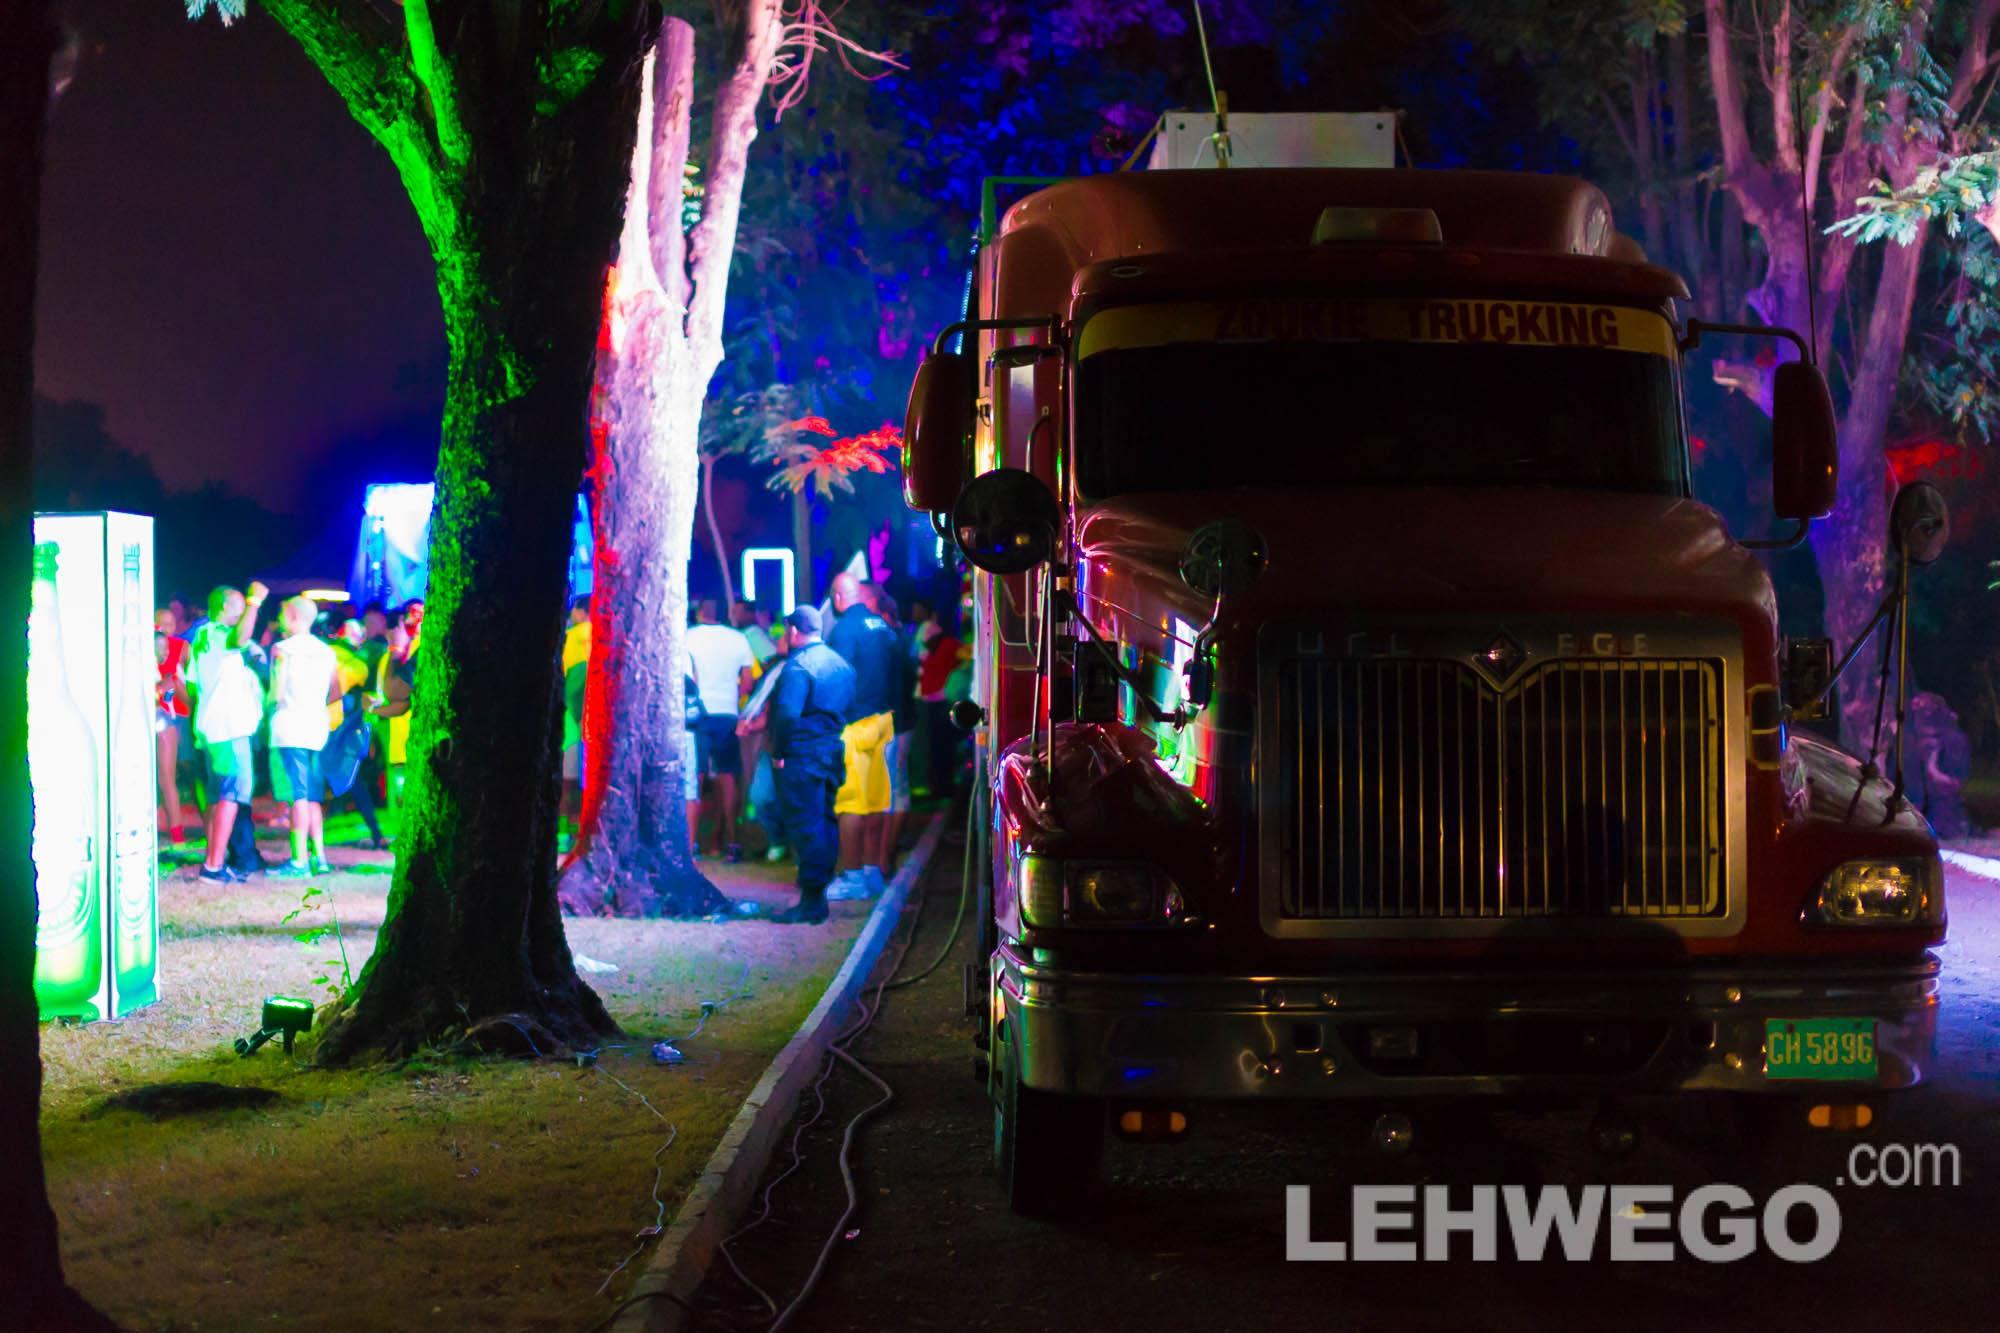 Sunset jouvert review, Jamaica carnival 2014,